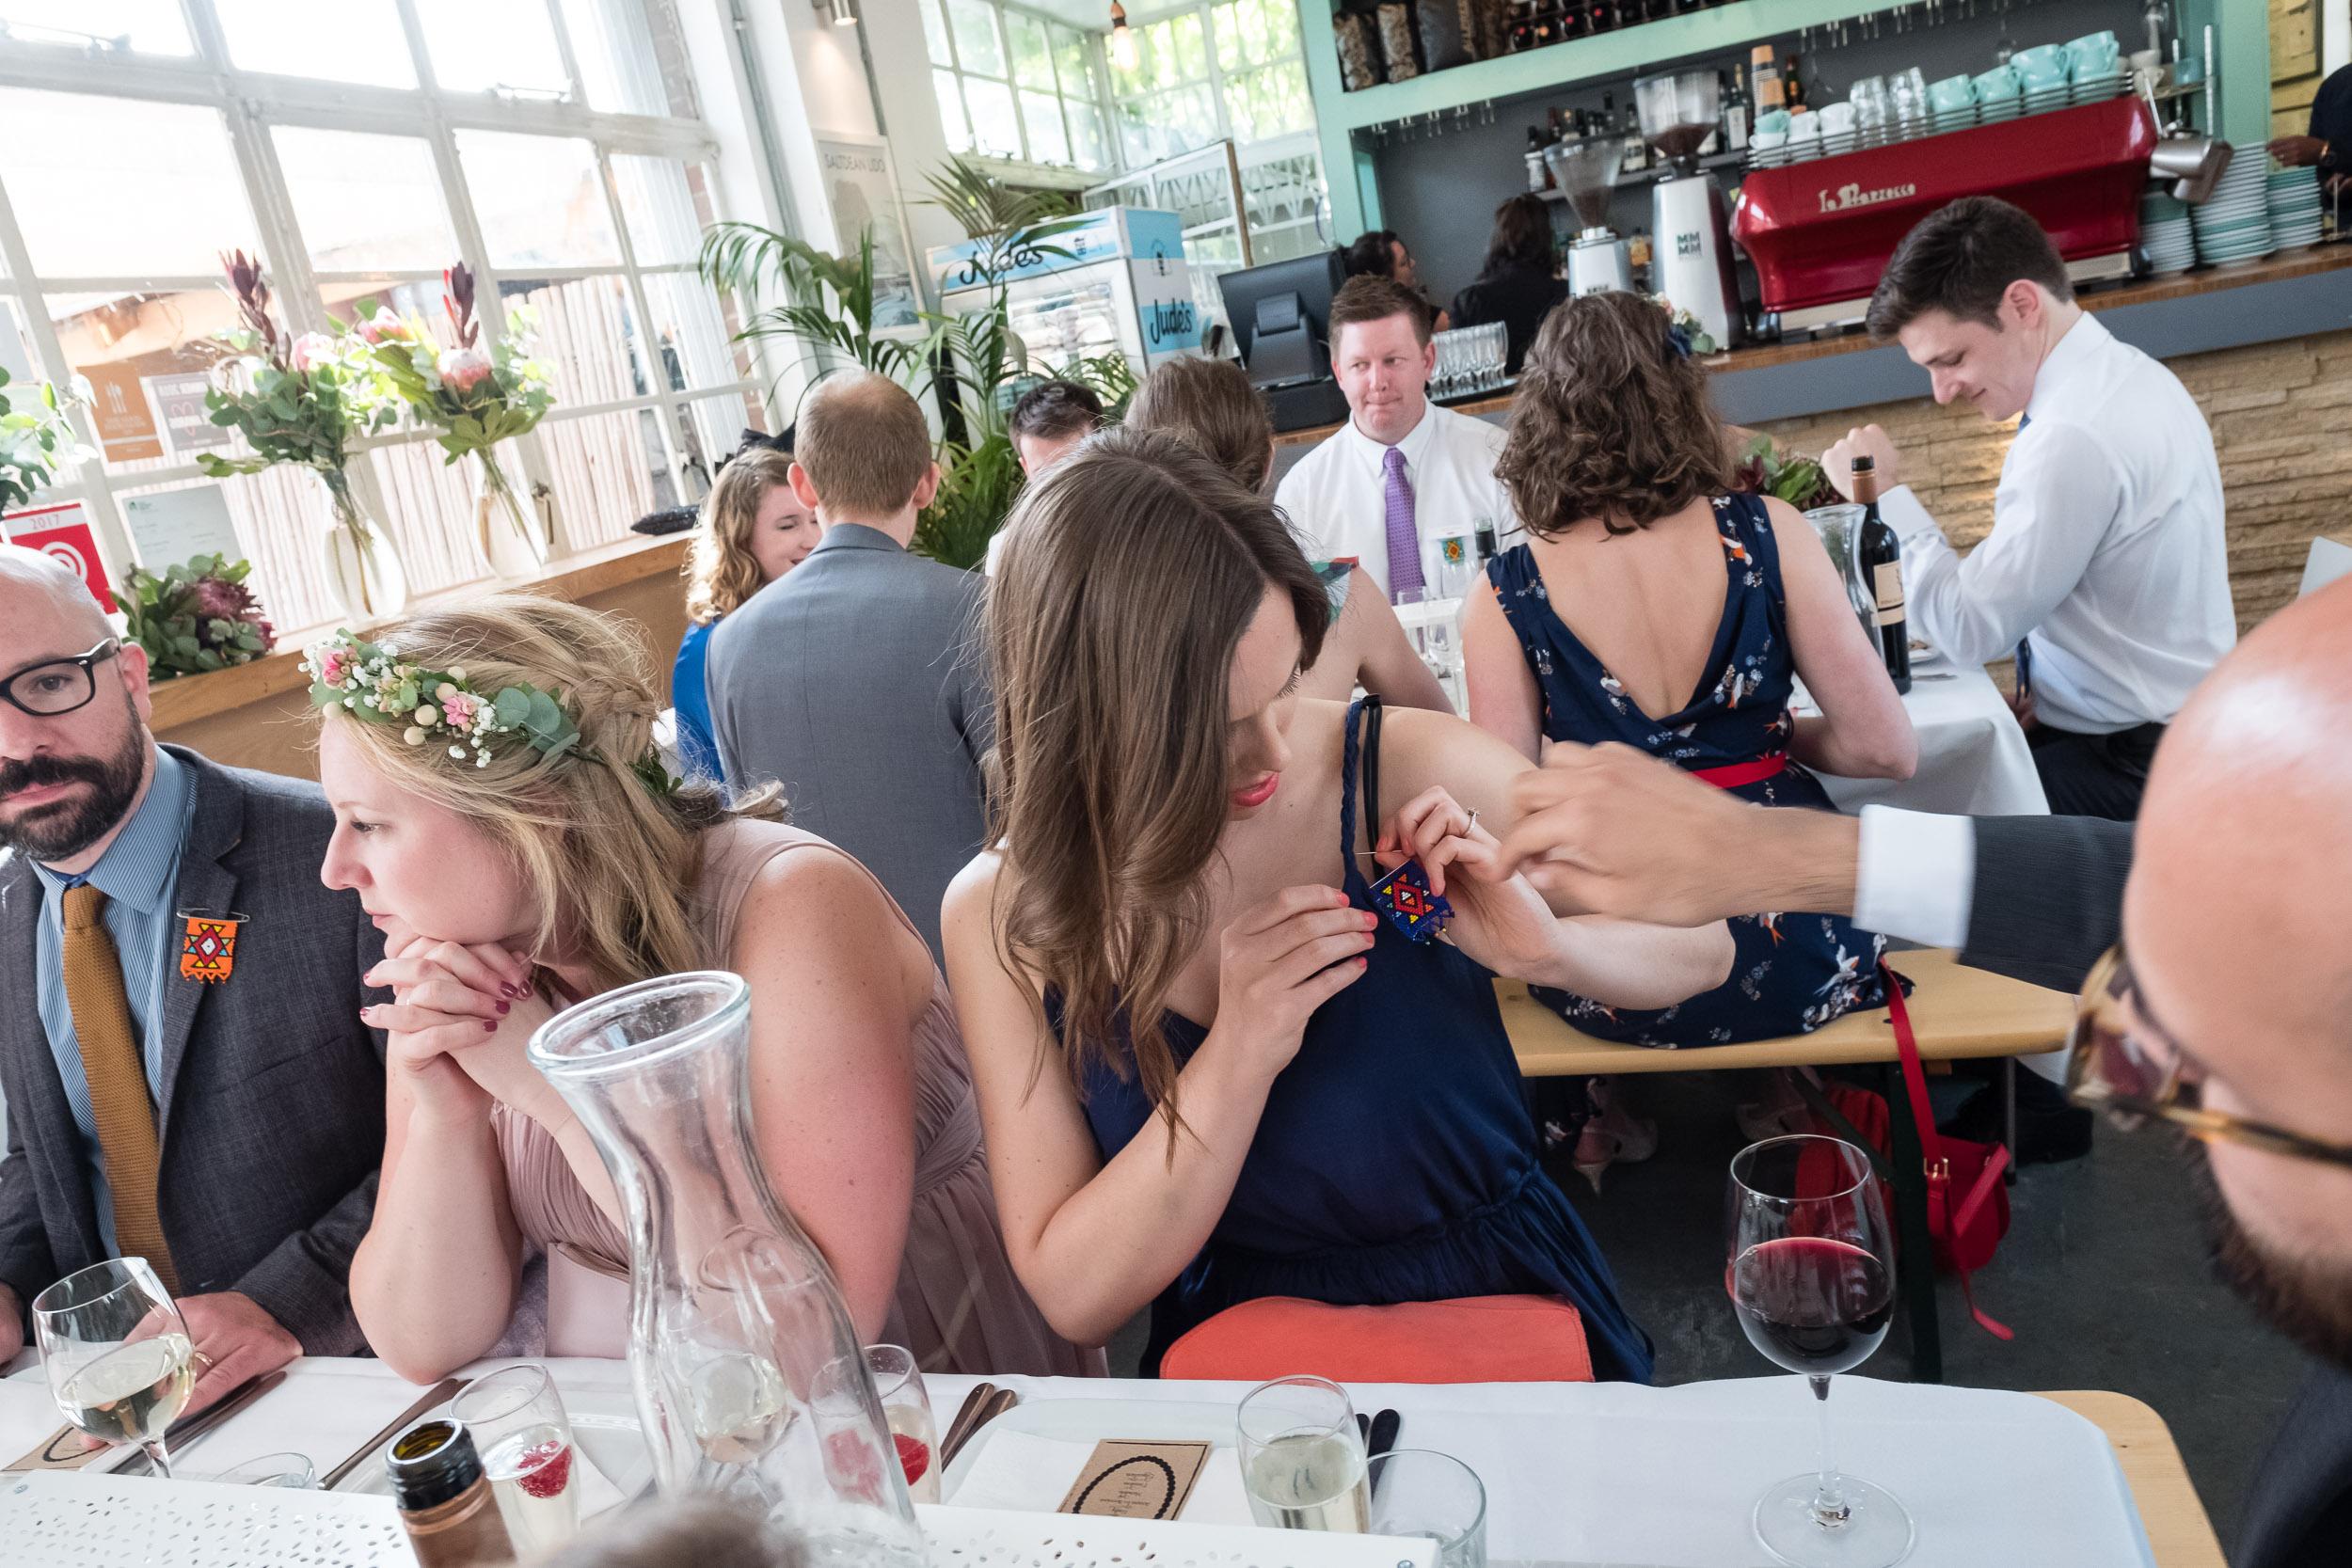 brockwell-lido-brixton-herne-hill-wedding-305.jpg